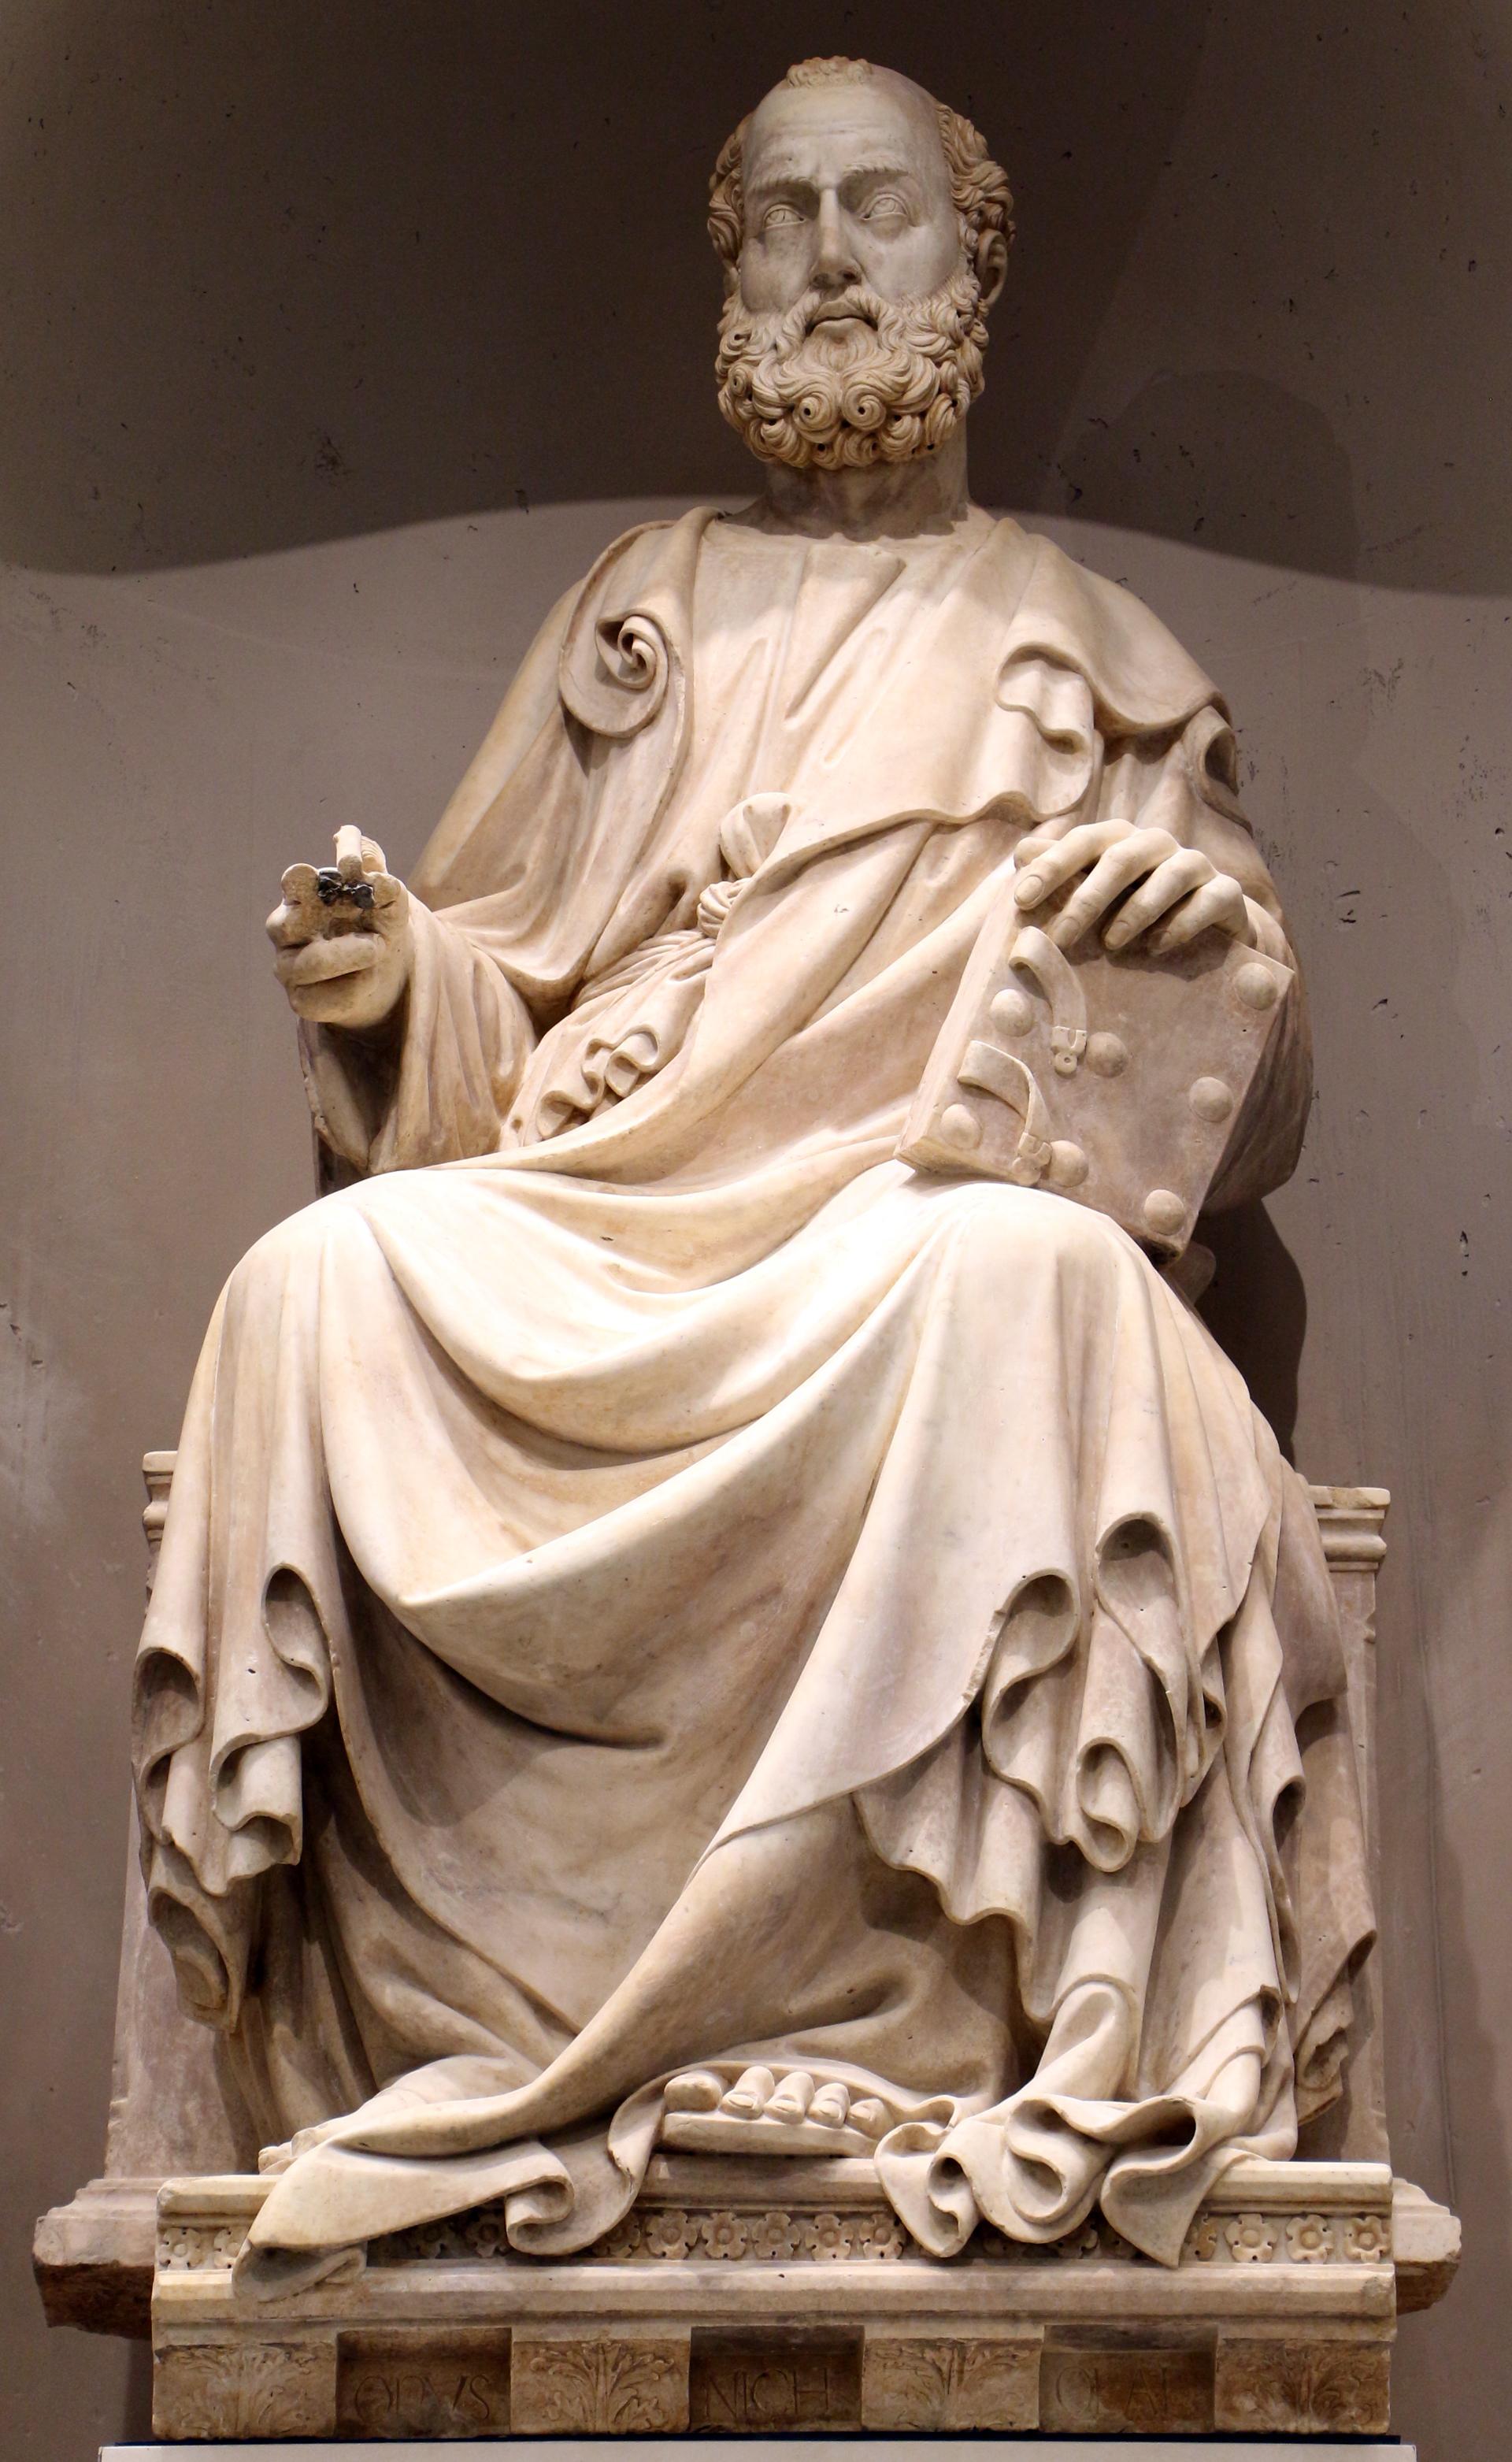 File:Niccolò di piero lamberti, san marco evangelista, 1408-1415, 01